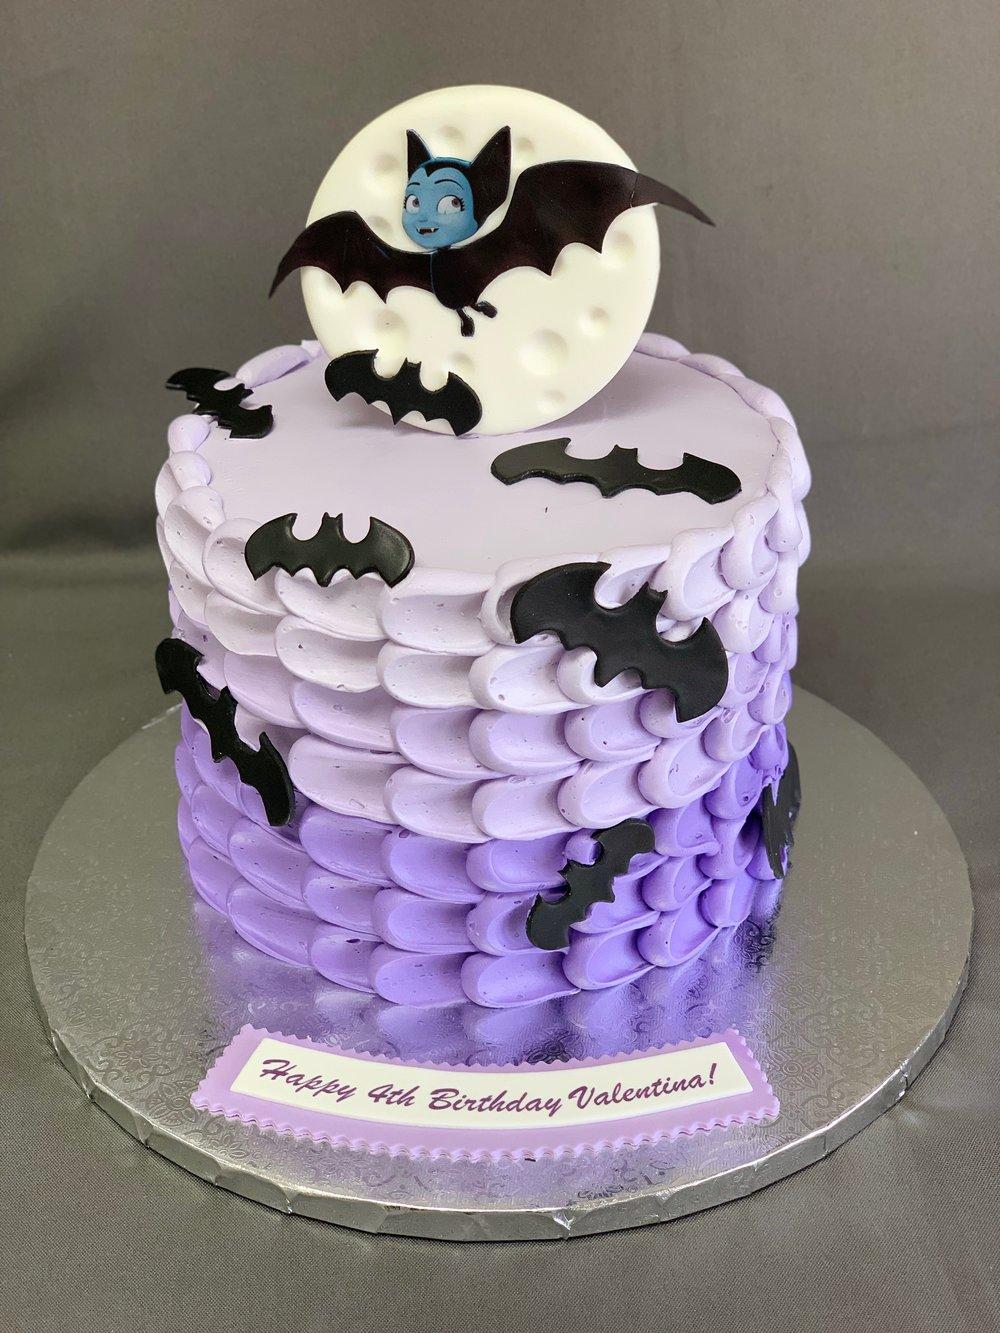 Best Vampirina Birthday Cake NJ